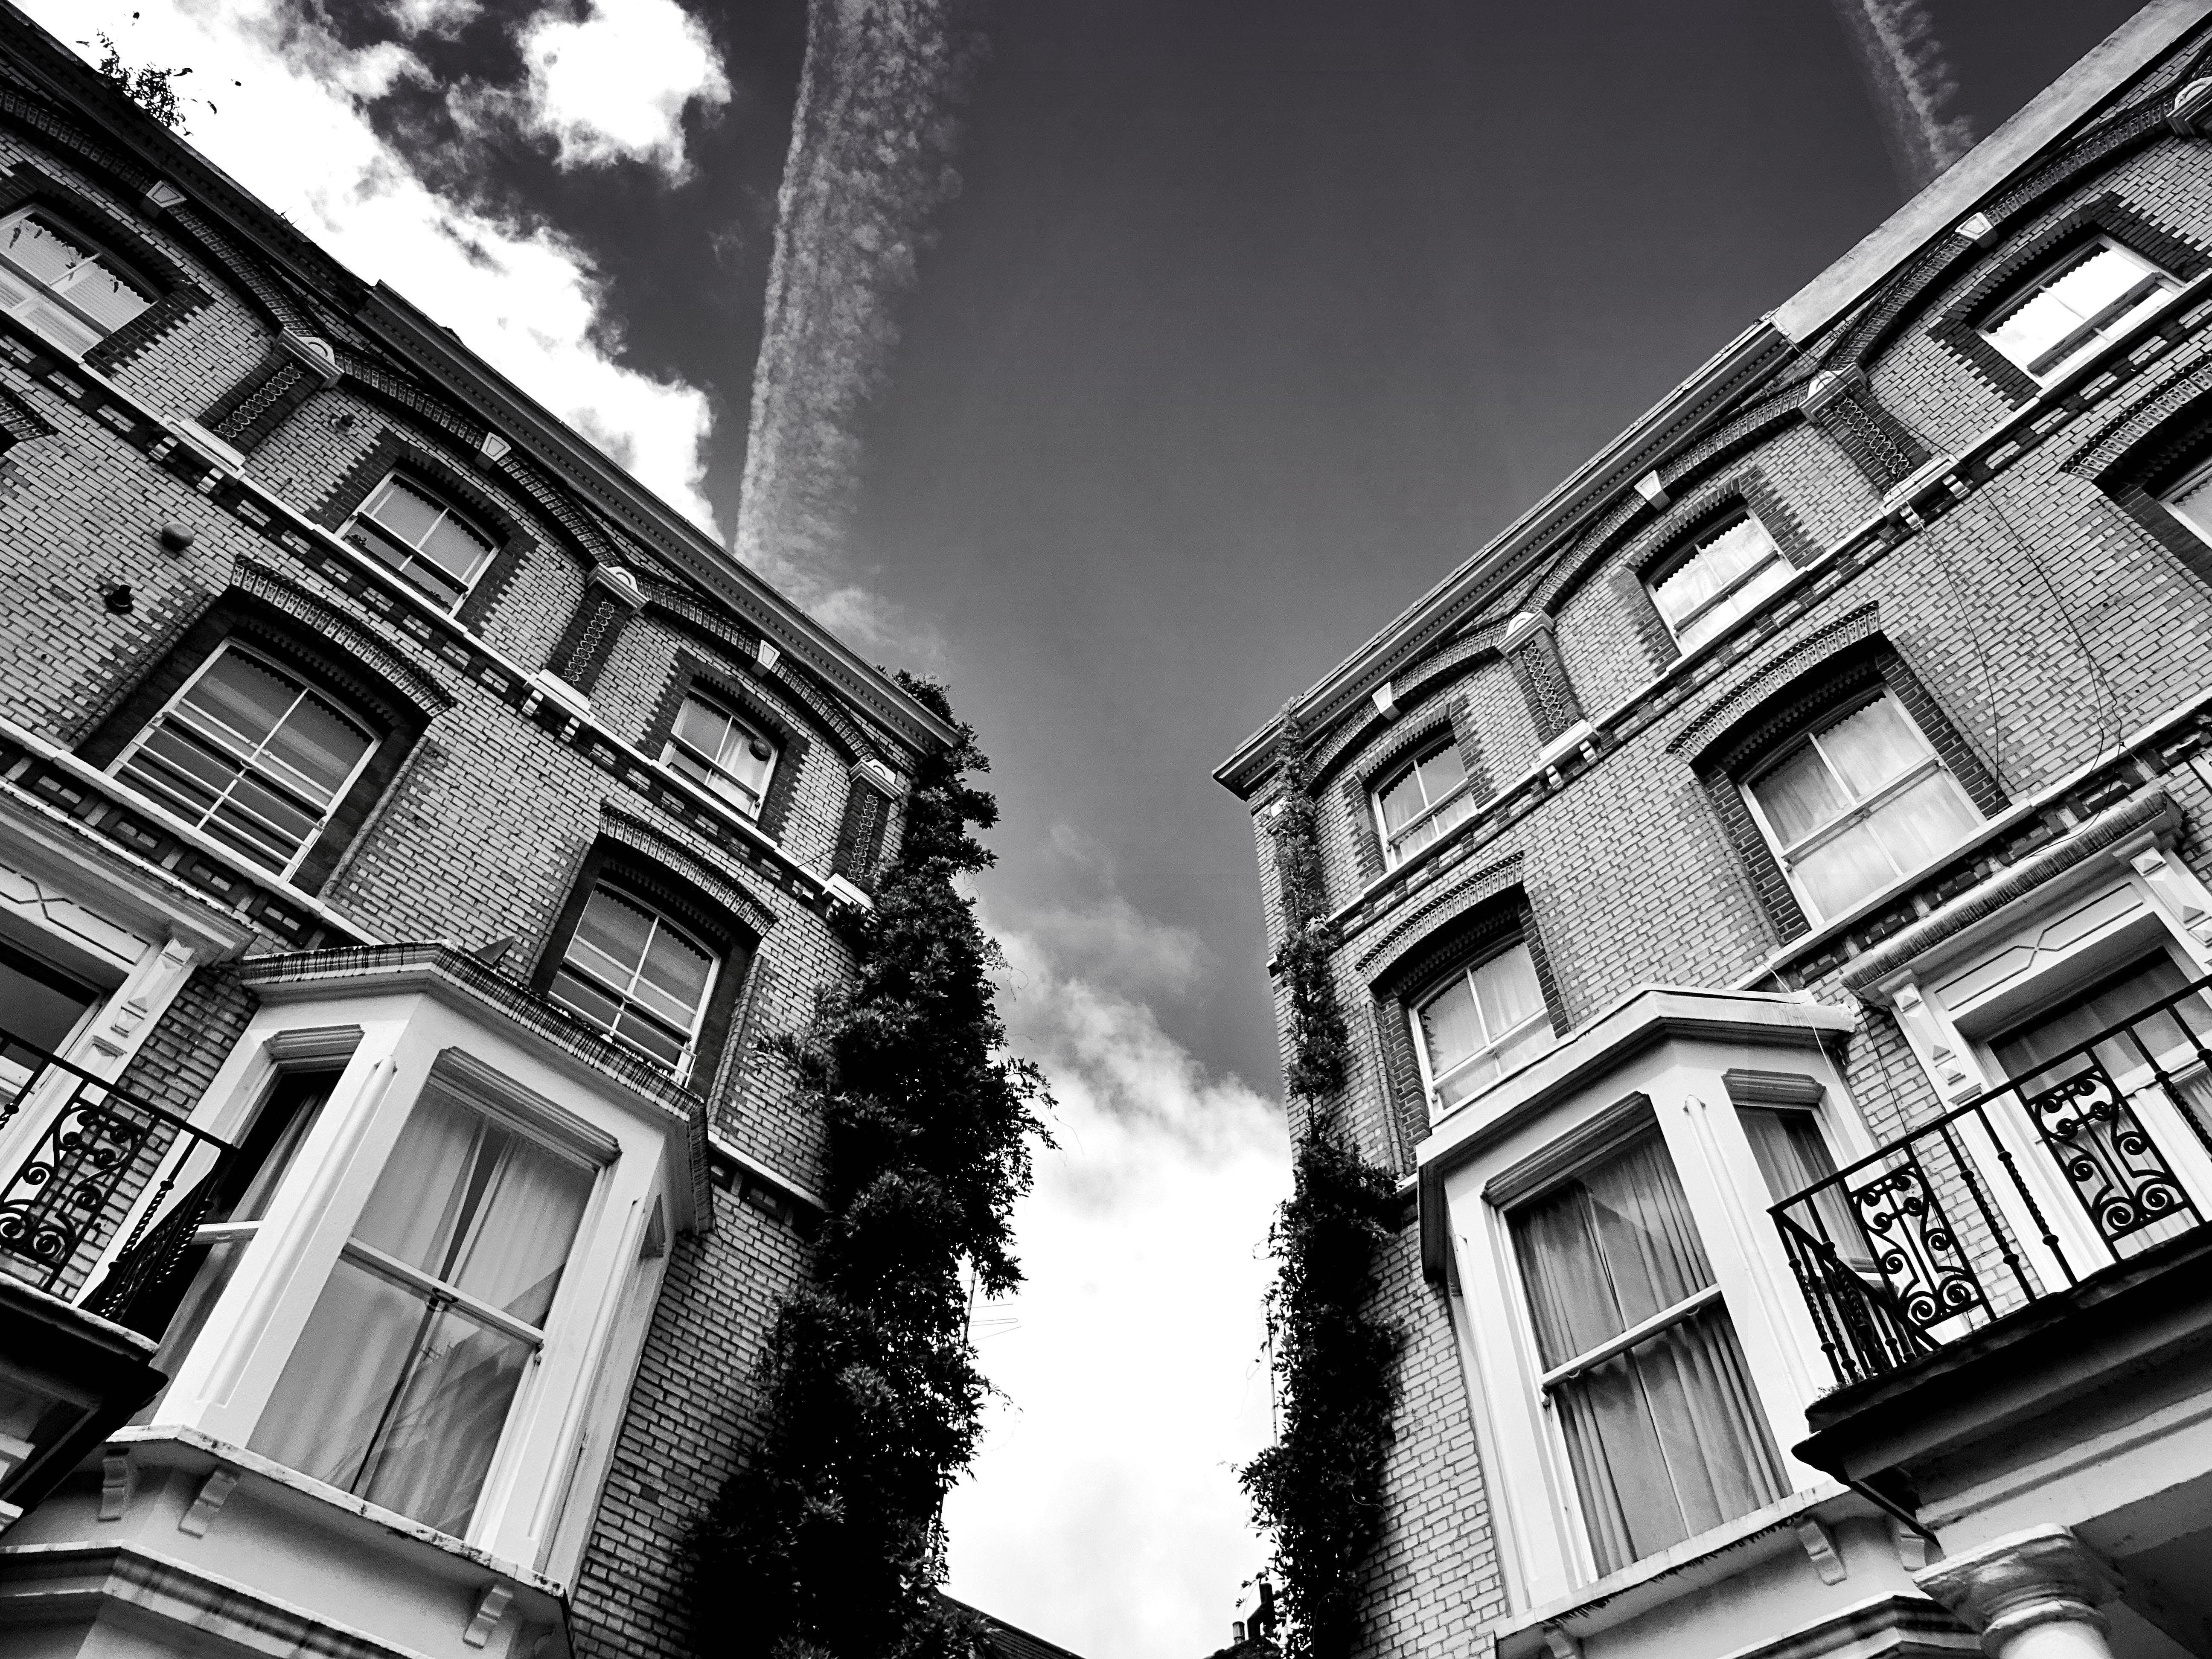 apartments, architecture, art